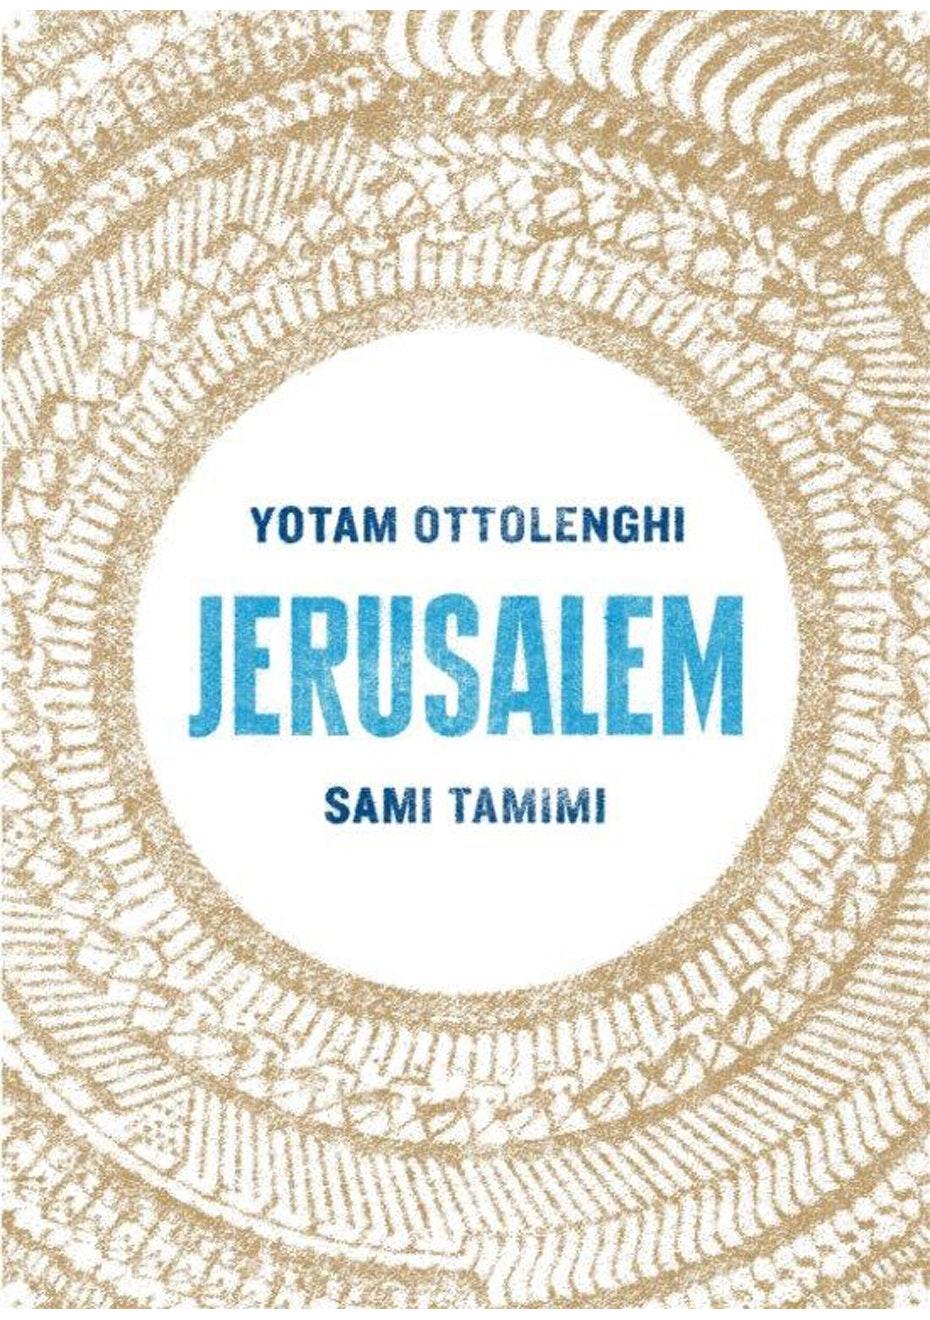 Jerusalem, by Yotam Ottolenghi & Sami Tamimi